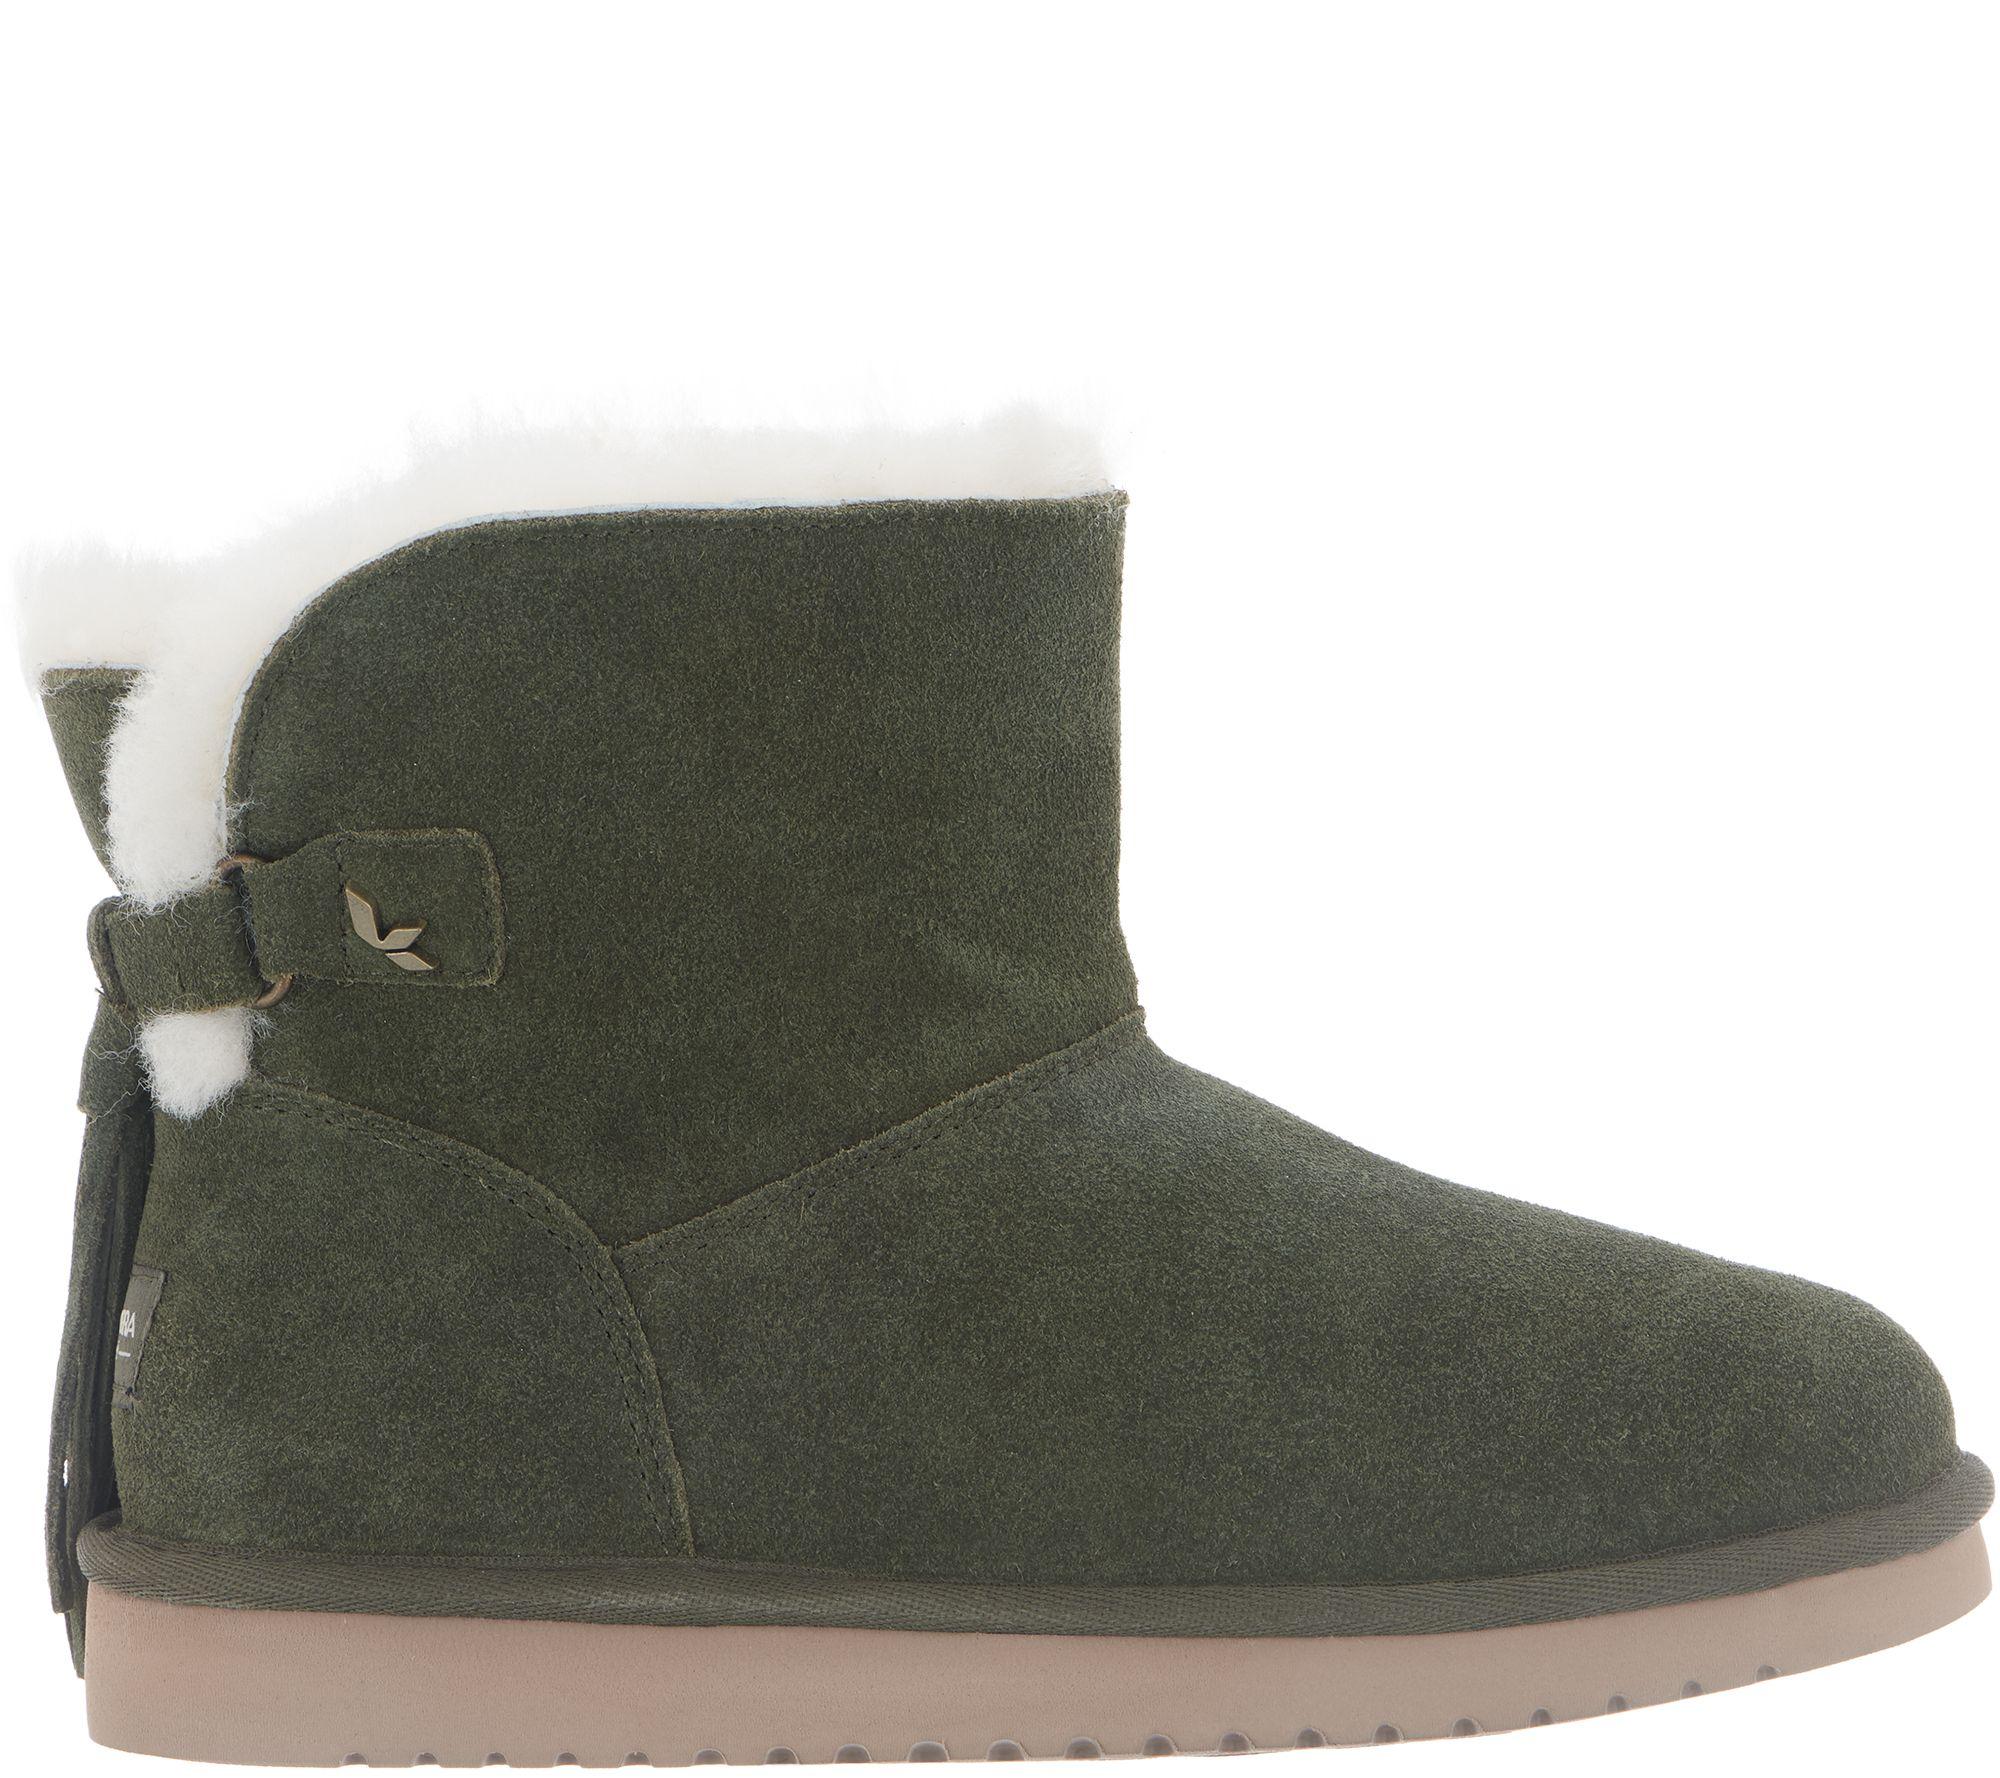 3e7c318888e Koolaburra by UGG Suede Tassel Mini Boots - Jaelyn - Page 1 — QVC.com